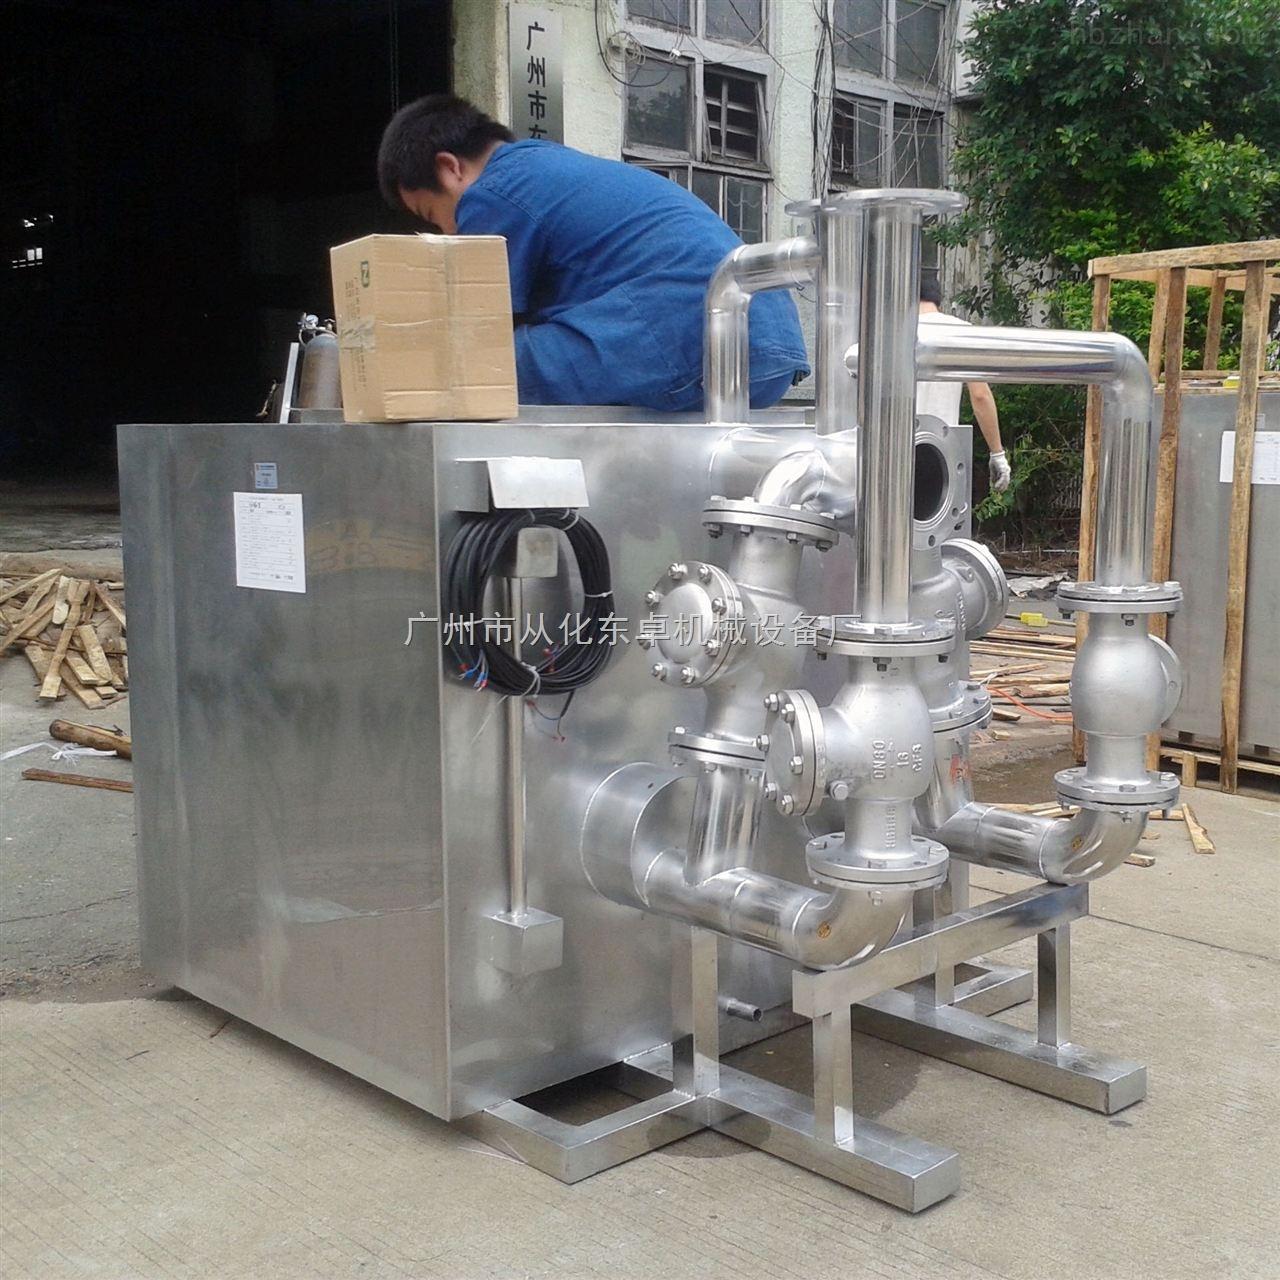 5kw/2 供应反冲洗污水提升器_微型发电机图片